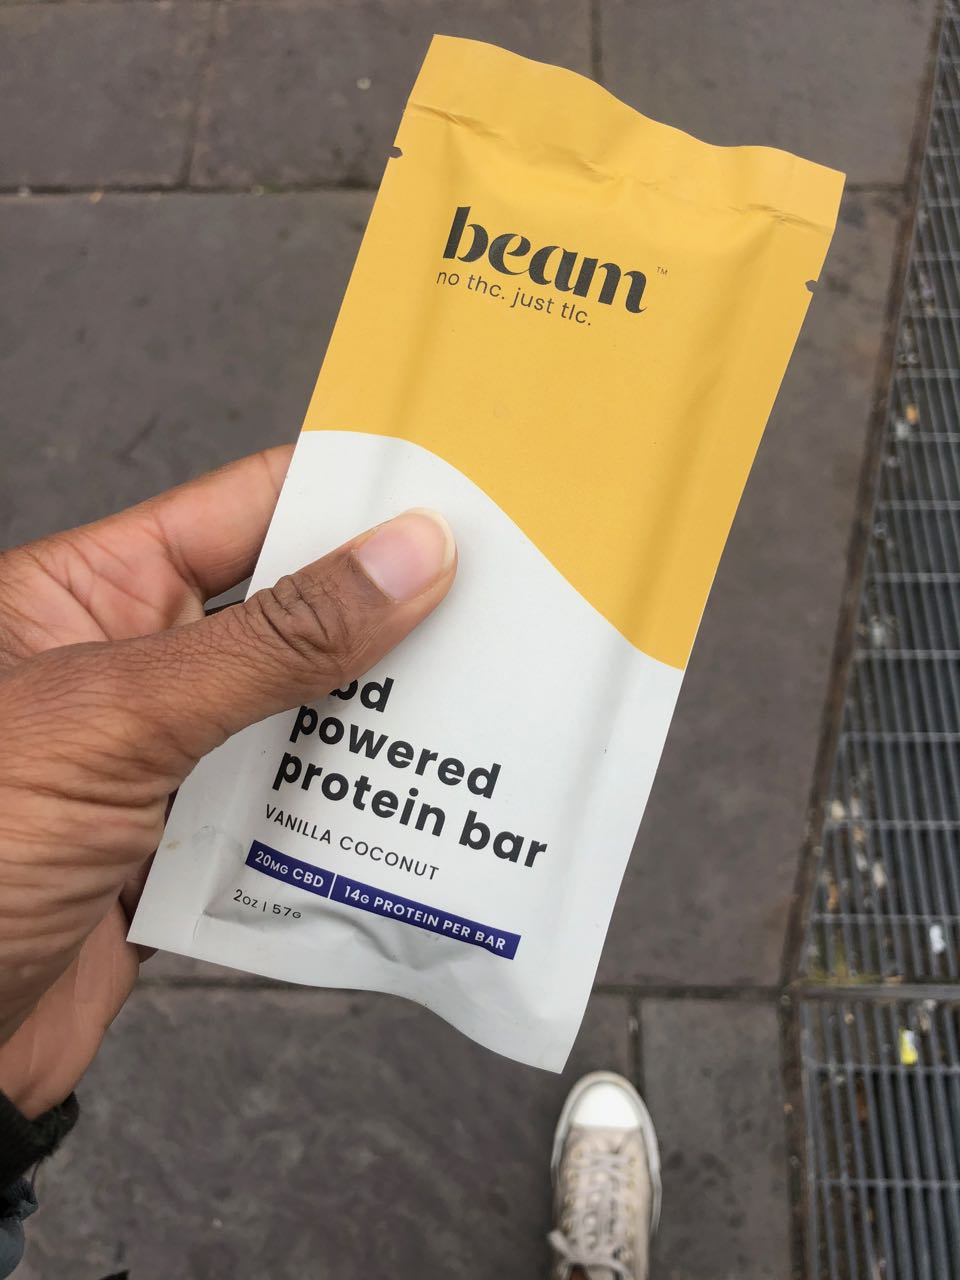 Beam's NYC Pop Up Shop Has CBD Oil On Tap